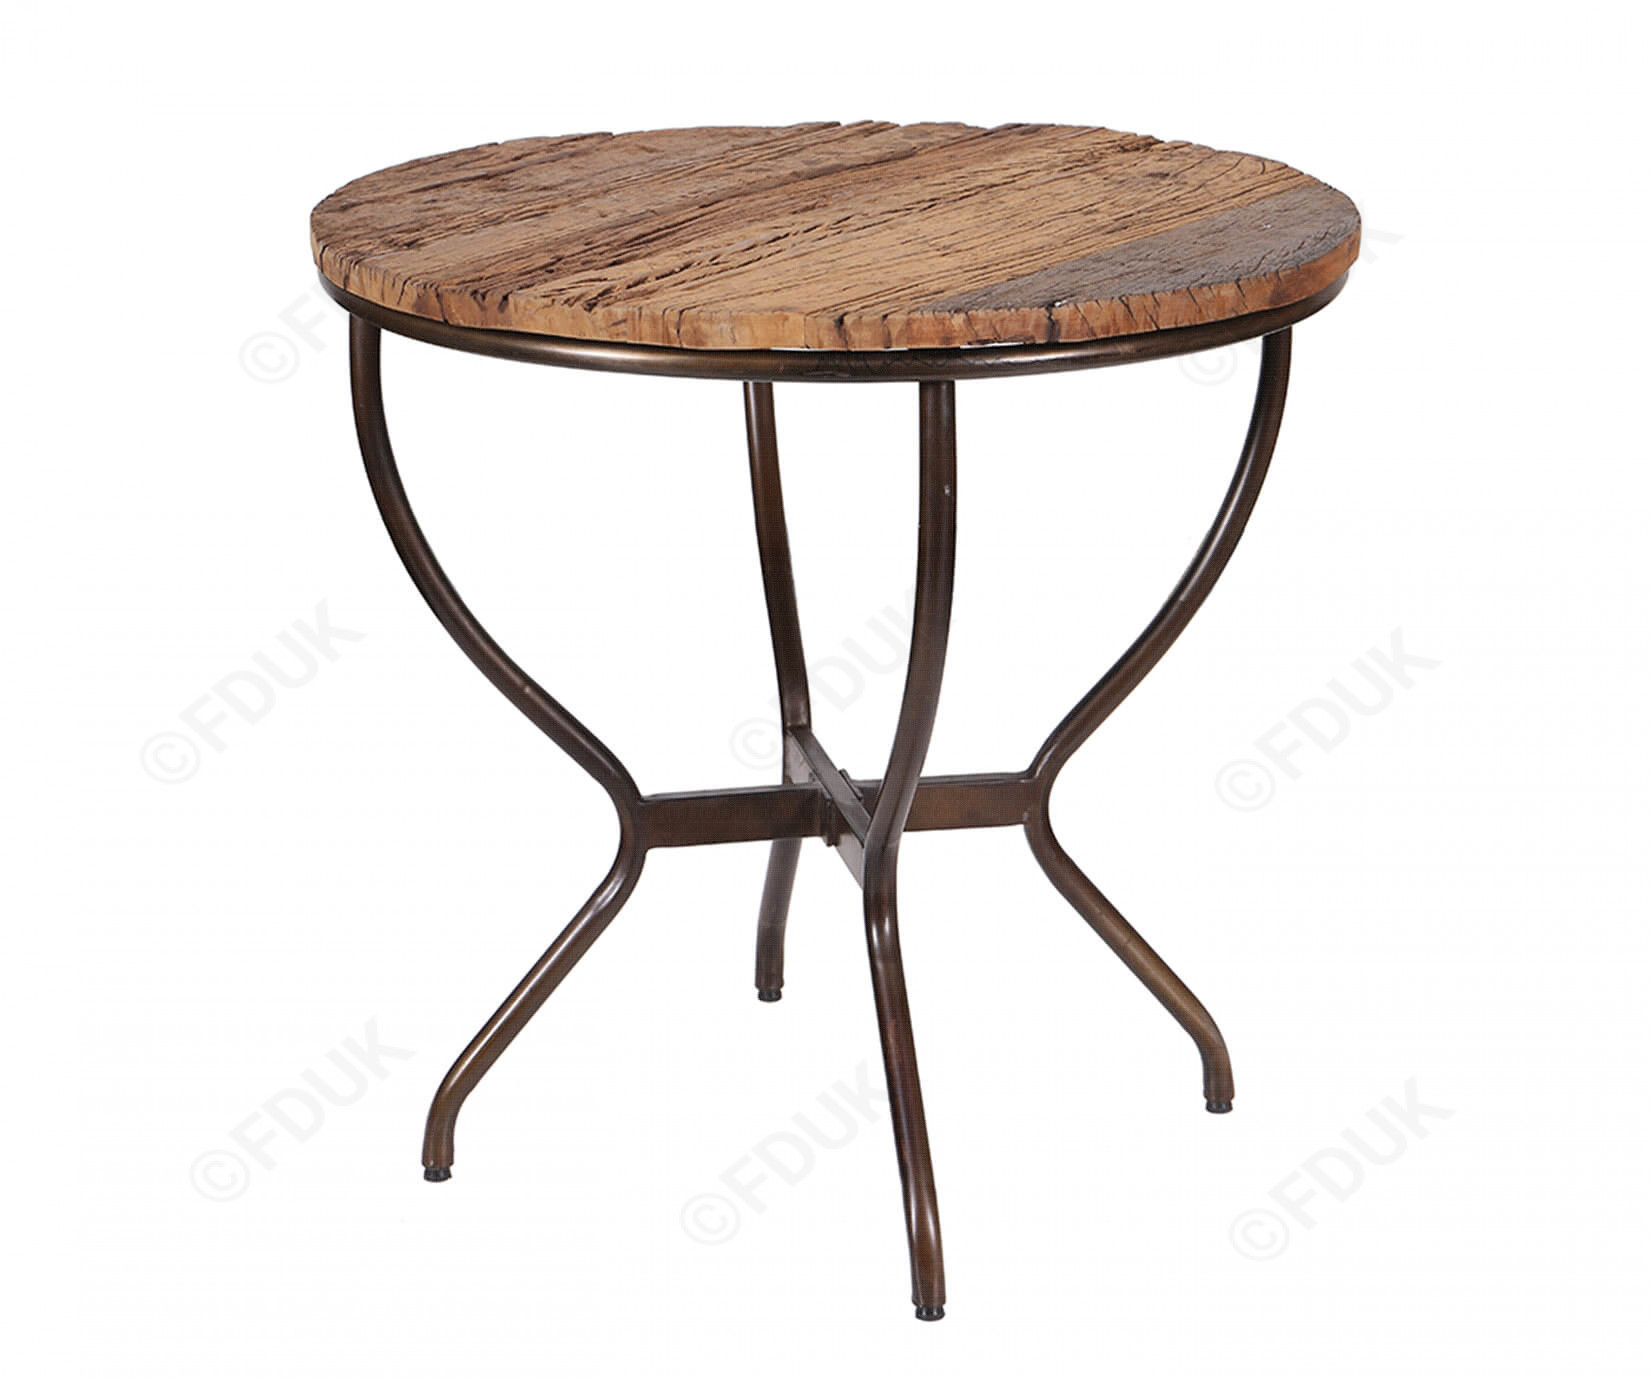 besp oak railway leather furniture wooden top side table fduk best end tables for west elm urban sofa big lots living room sets acrylic nesting sauder home entertainment carolina